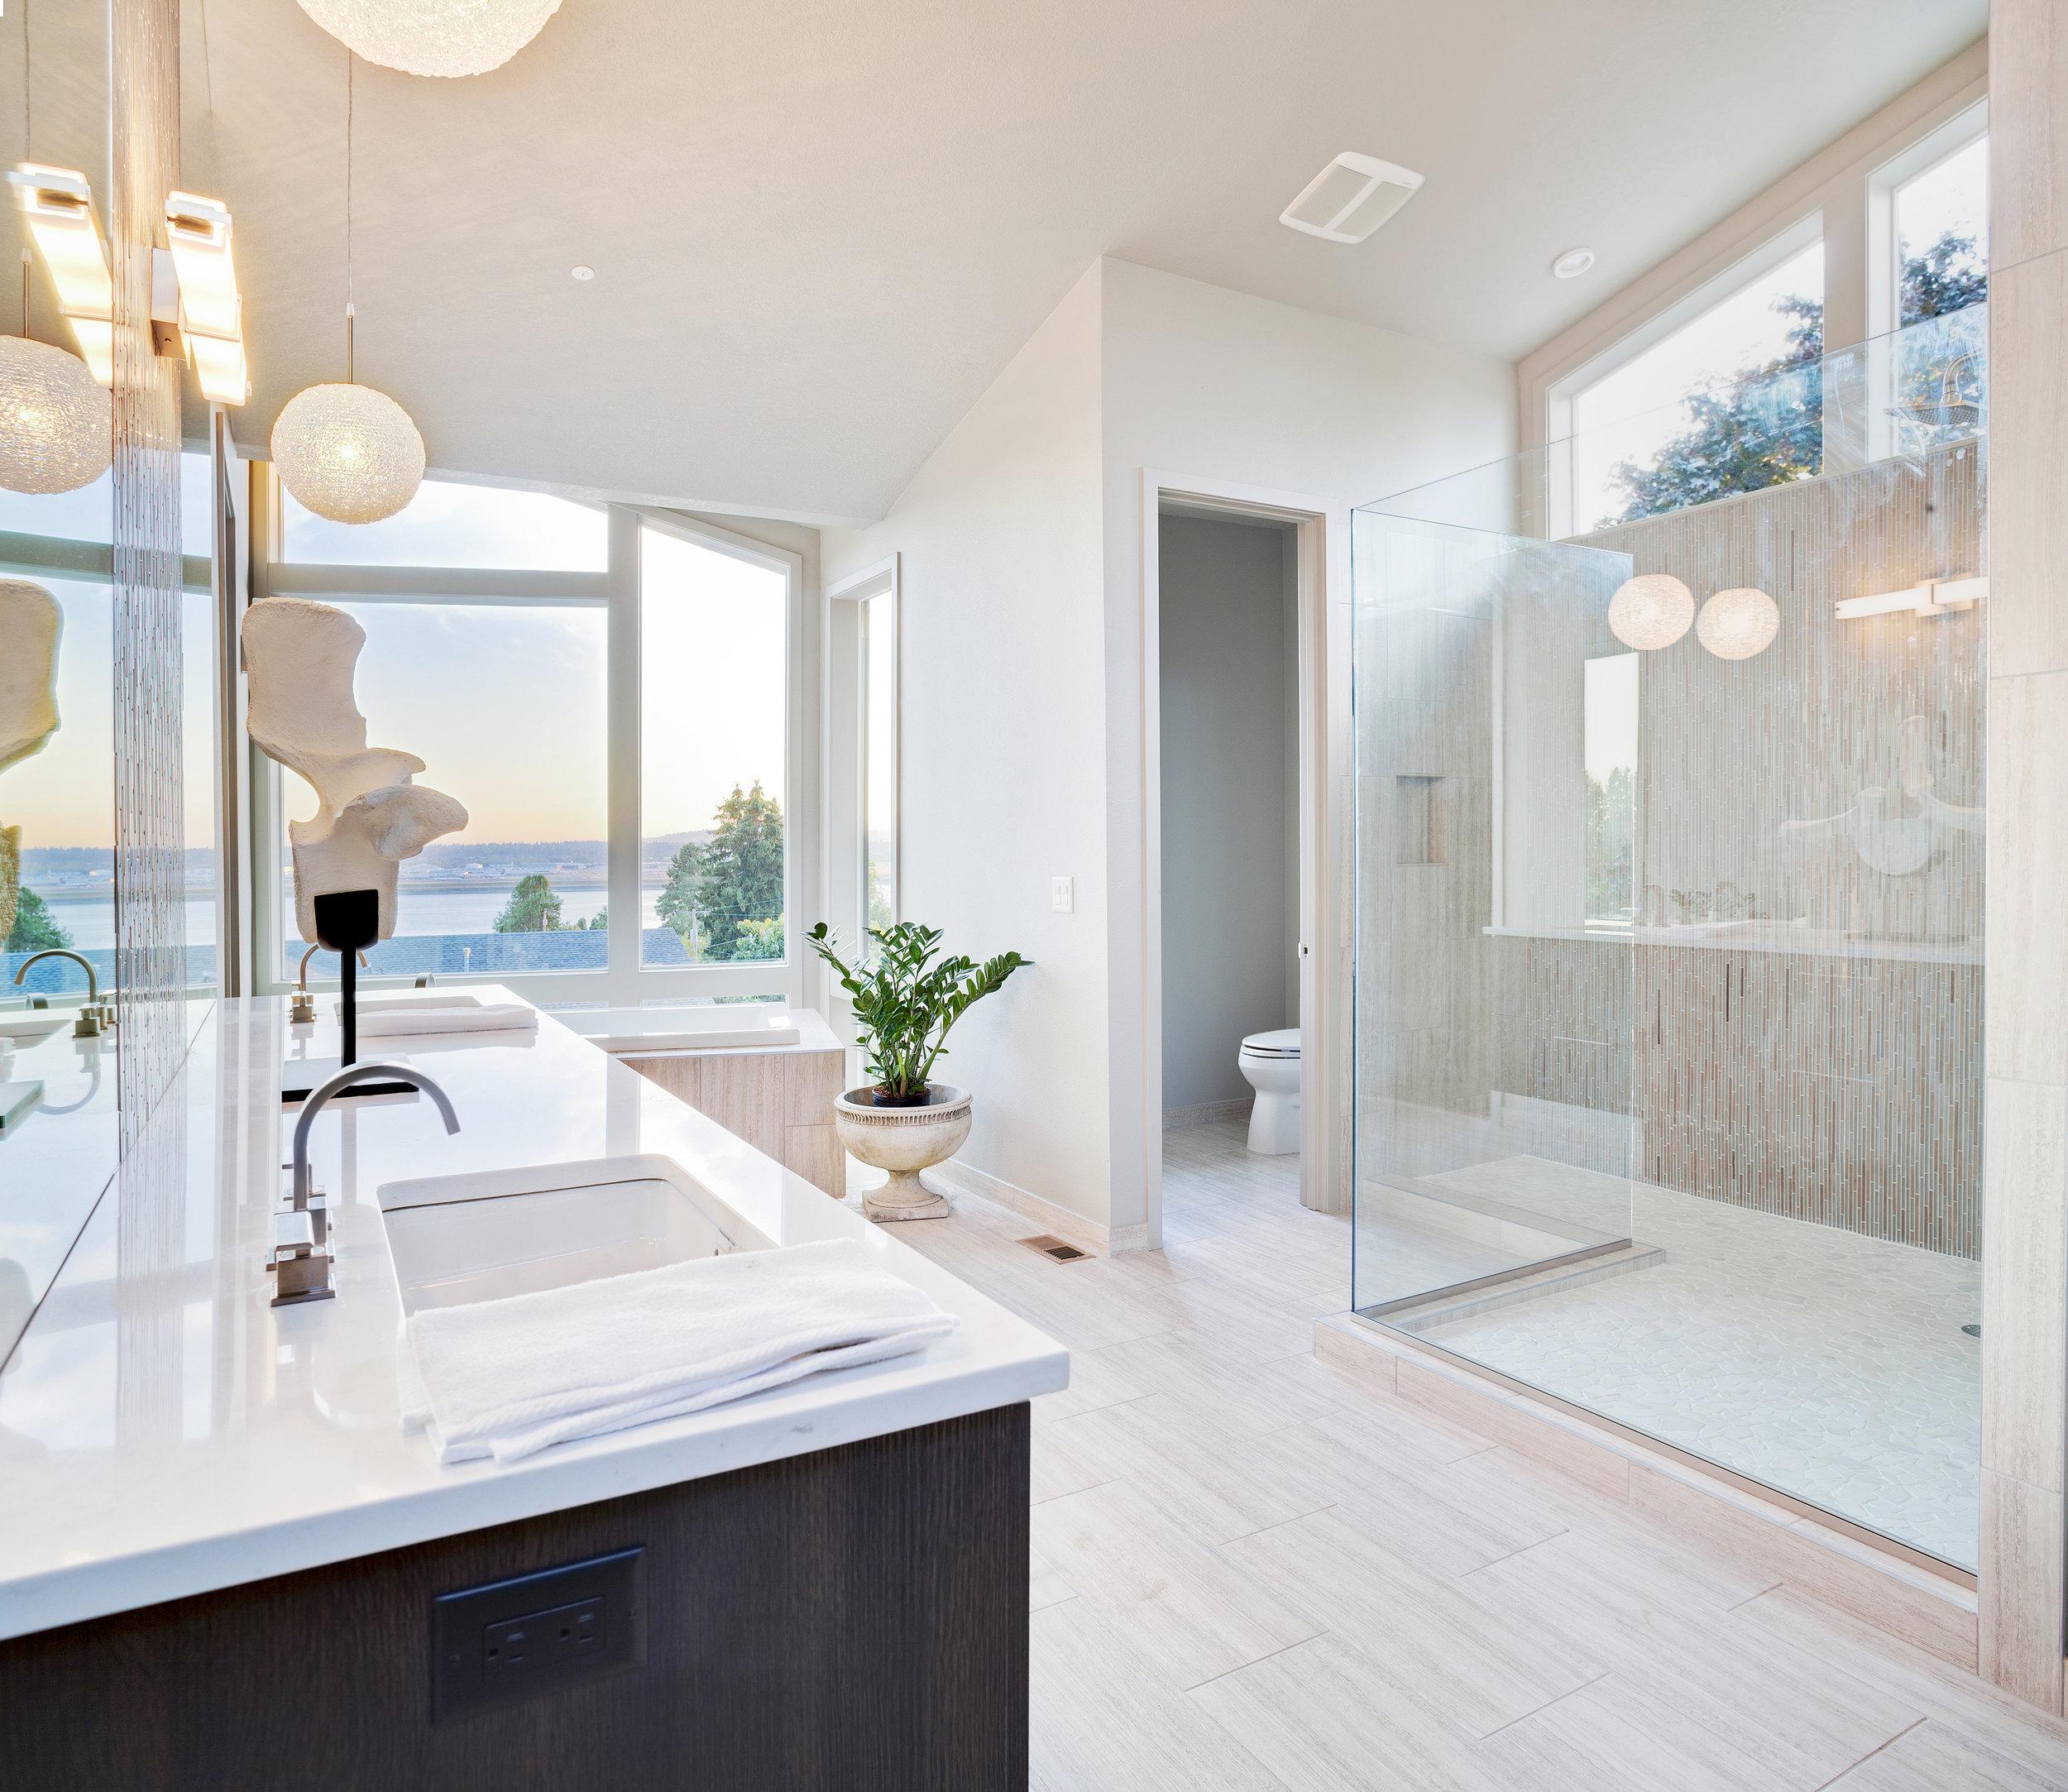 stock-photo-beautiful-large-bathroom-in-luxury-home-115941301.jpg